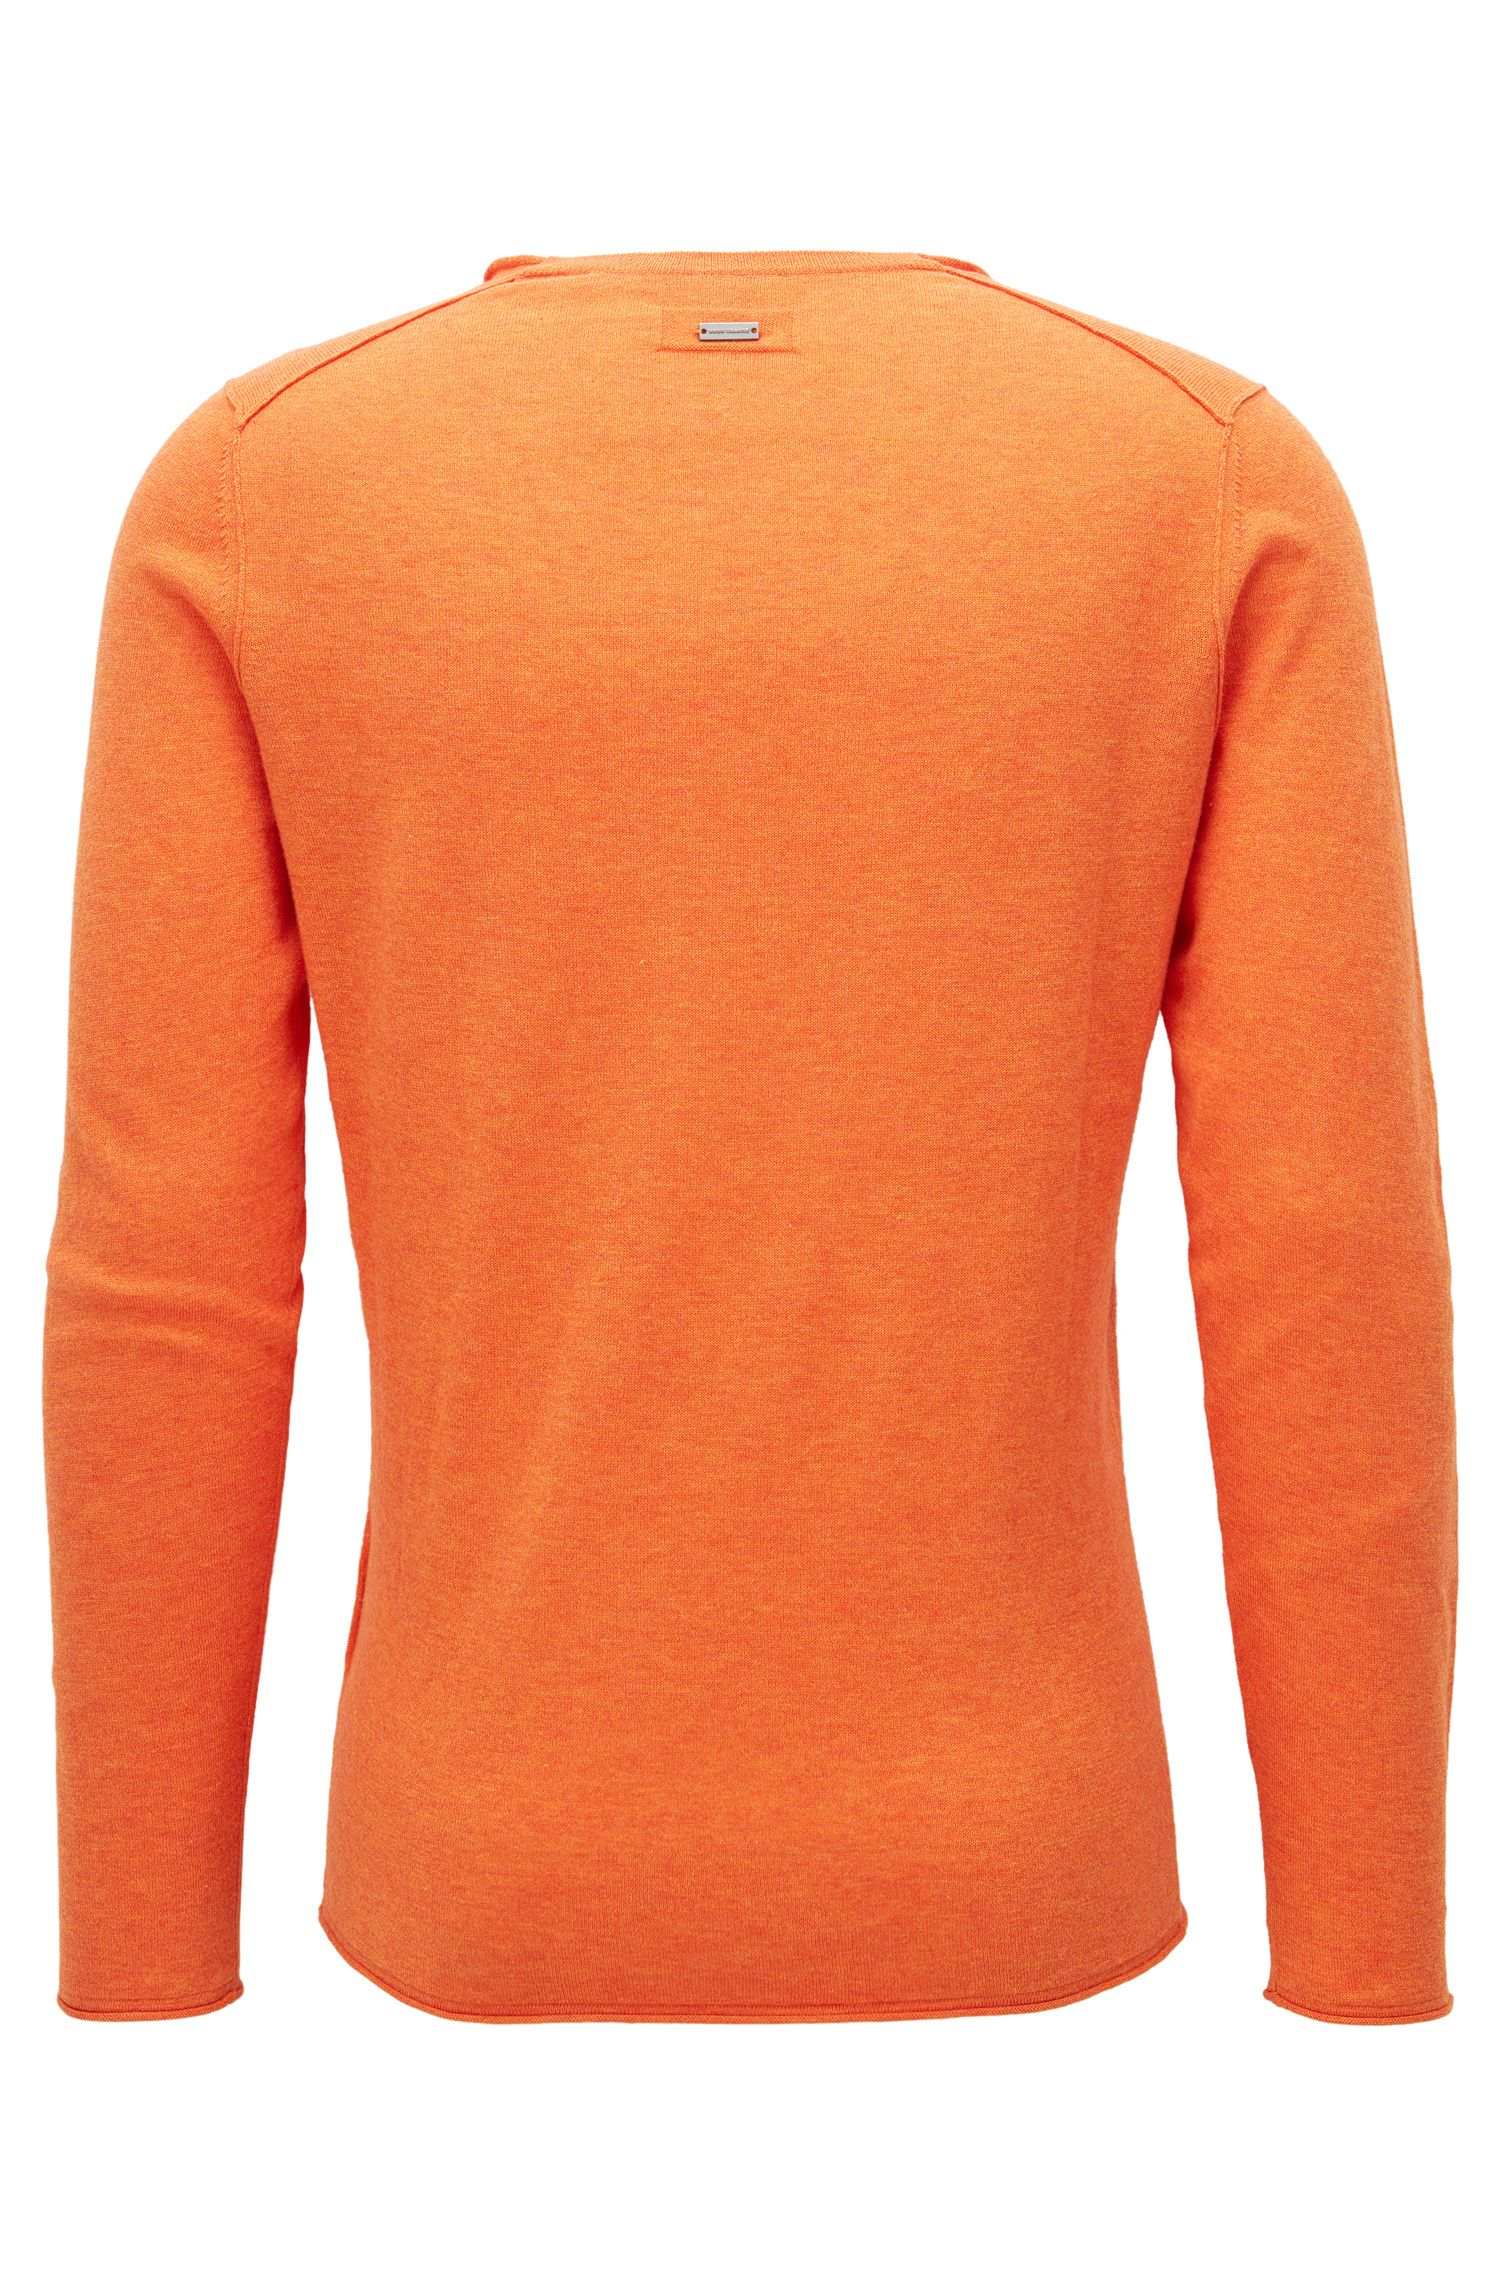 Heathered Cotton Sweater, Slim Fit | Kamiro